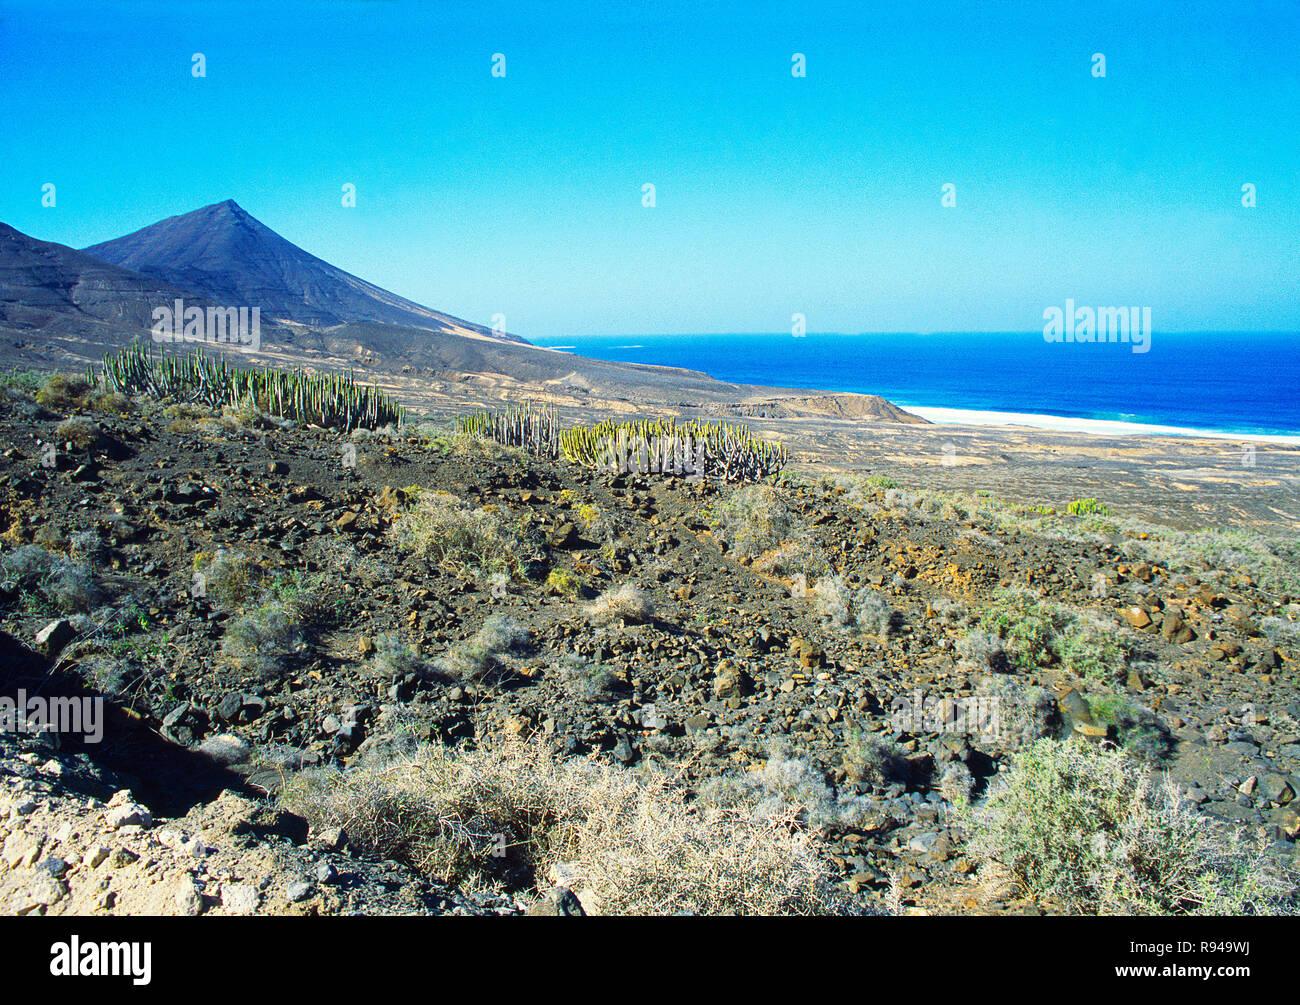 Jandia Nature Reserve. Fuerteventura, Canary Islands, Spain. Stock Photo